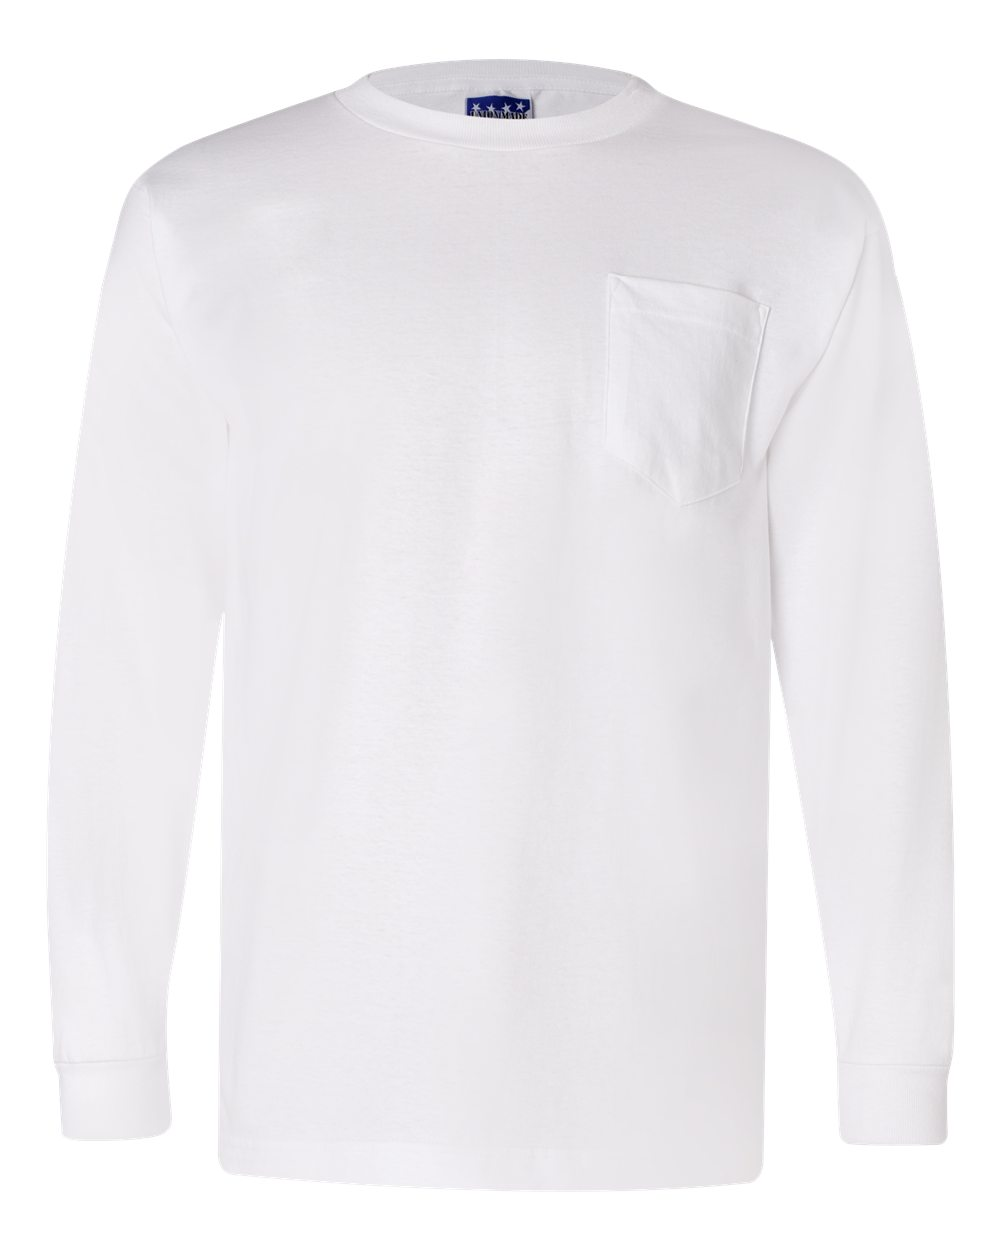 1425b063499 Opentip.com  Bayside 3055 Union-Made Long Sleeve T-Shirt with A Pocket